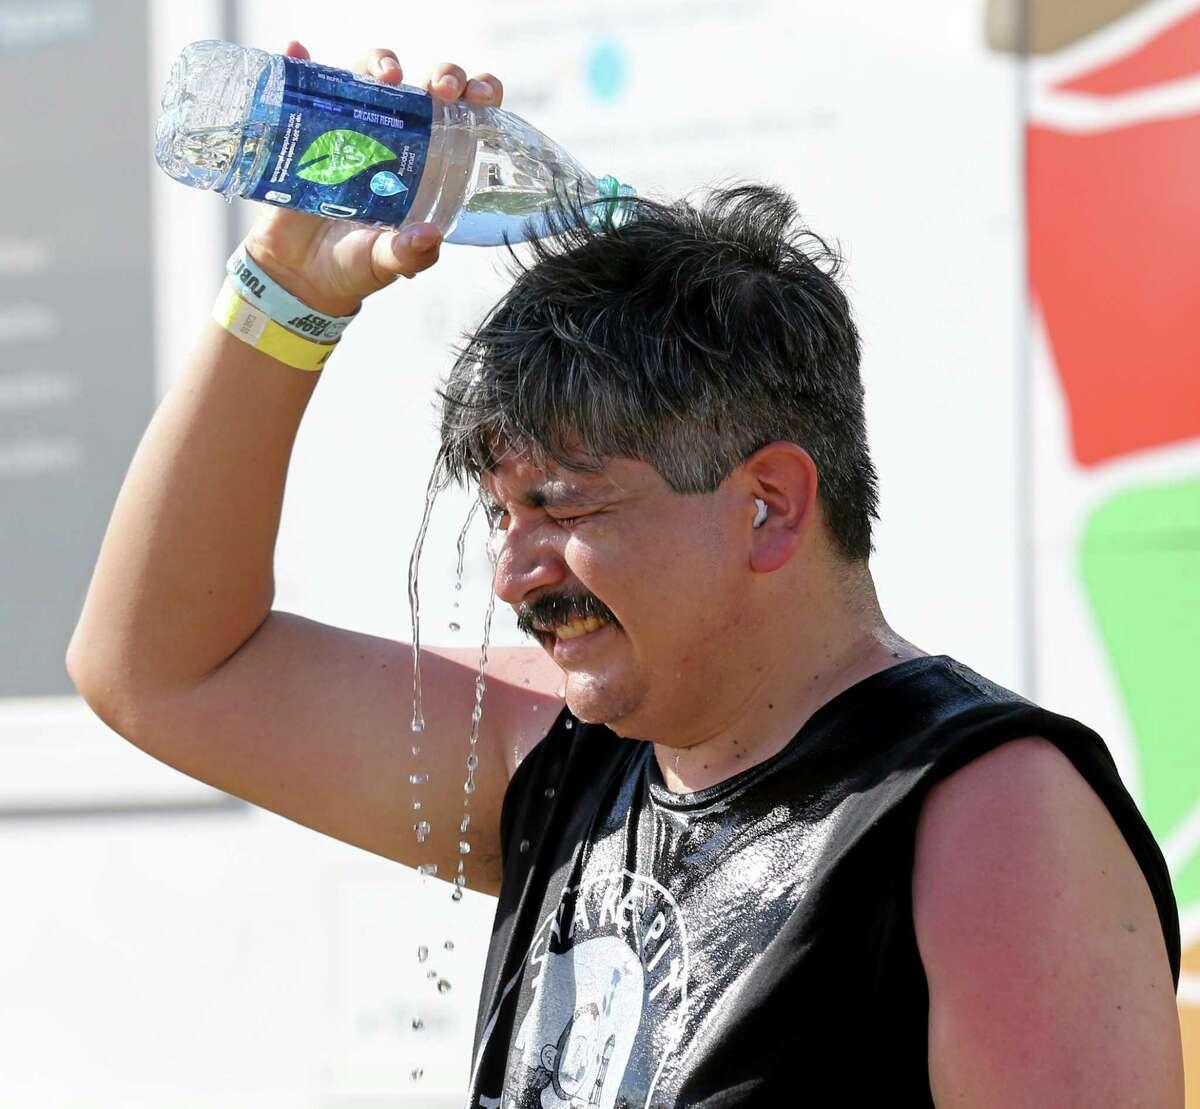 Big names headlining controversial Central Texas tubing